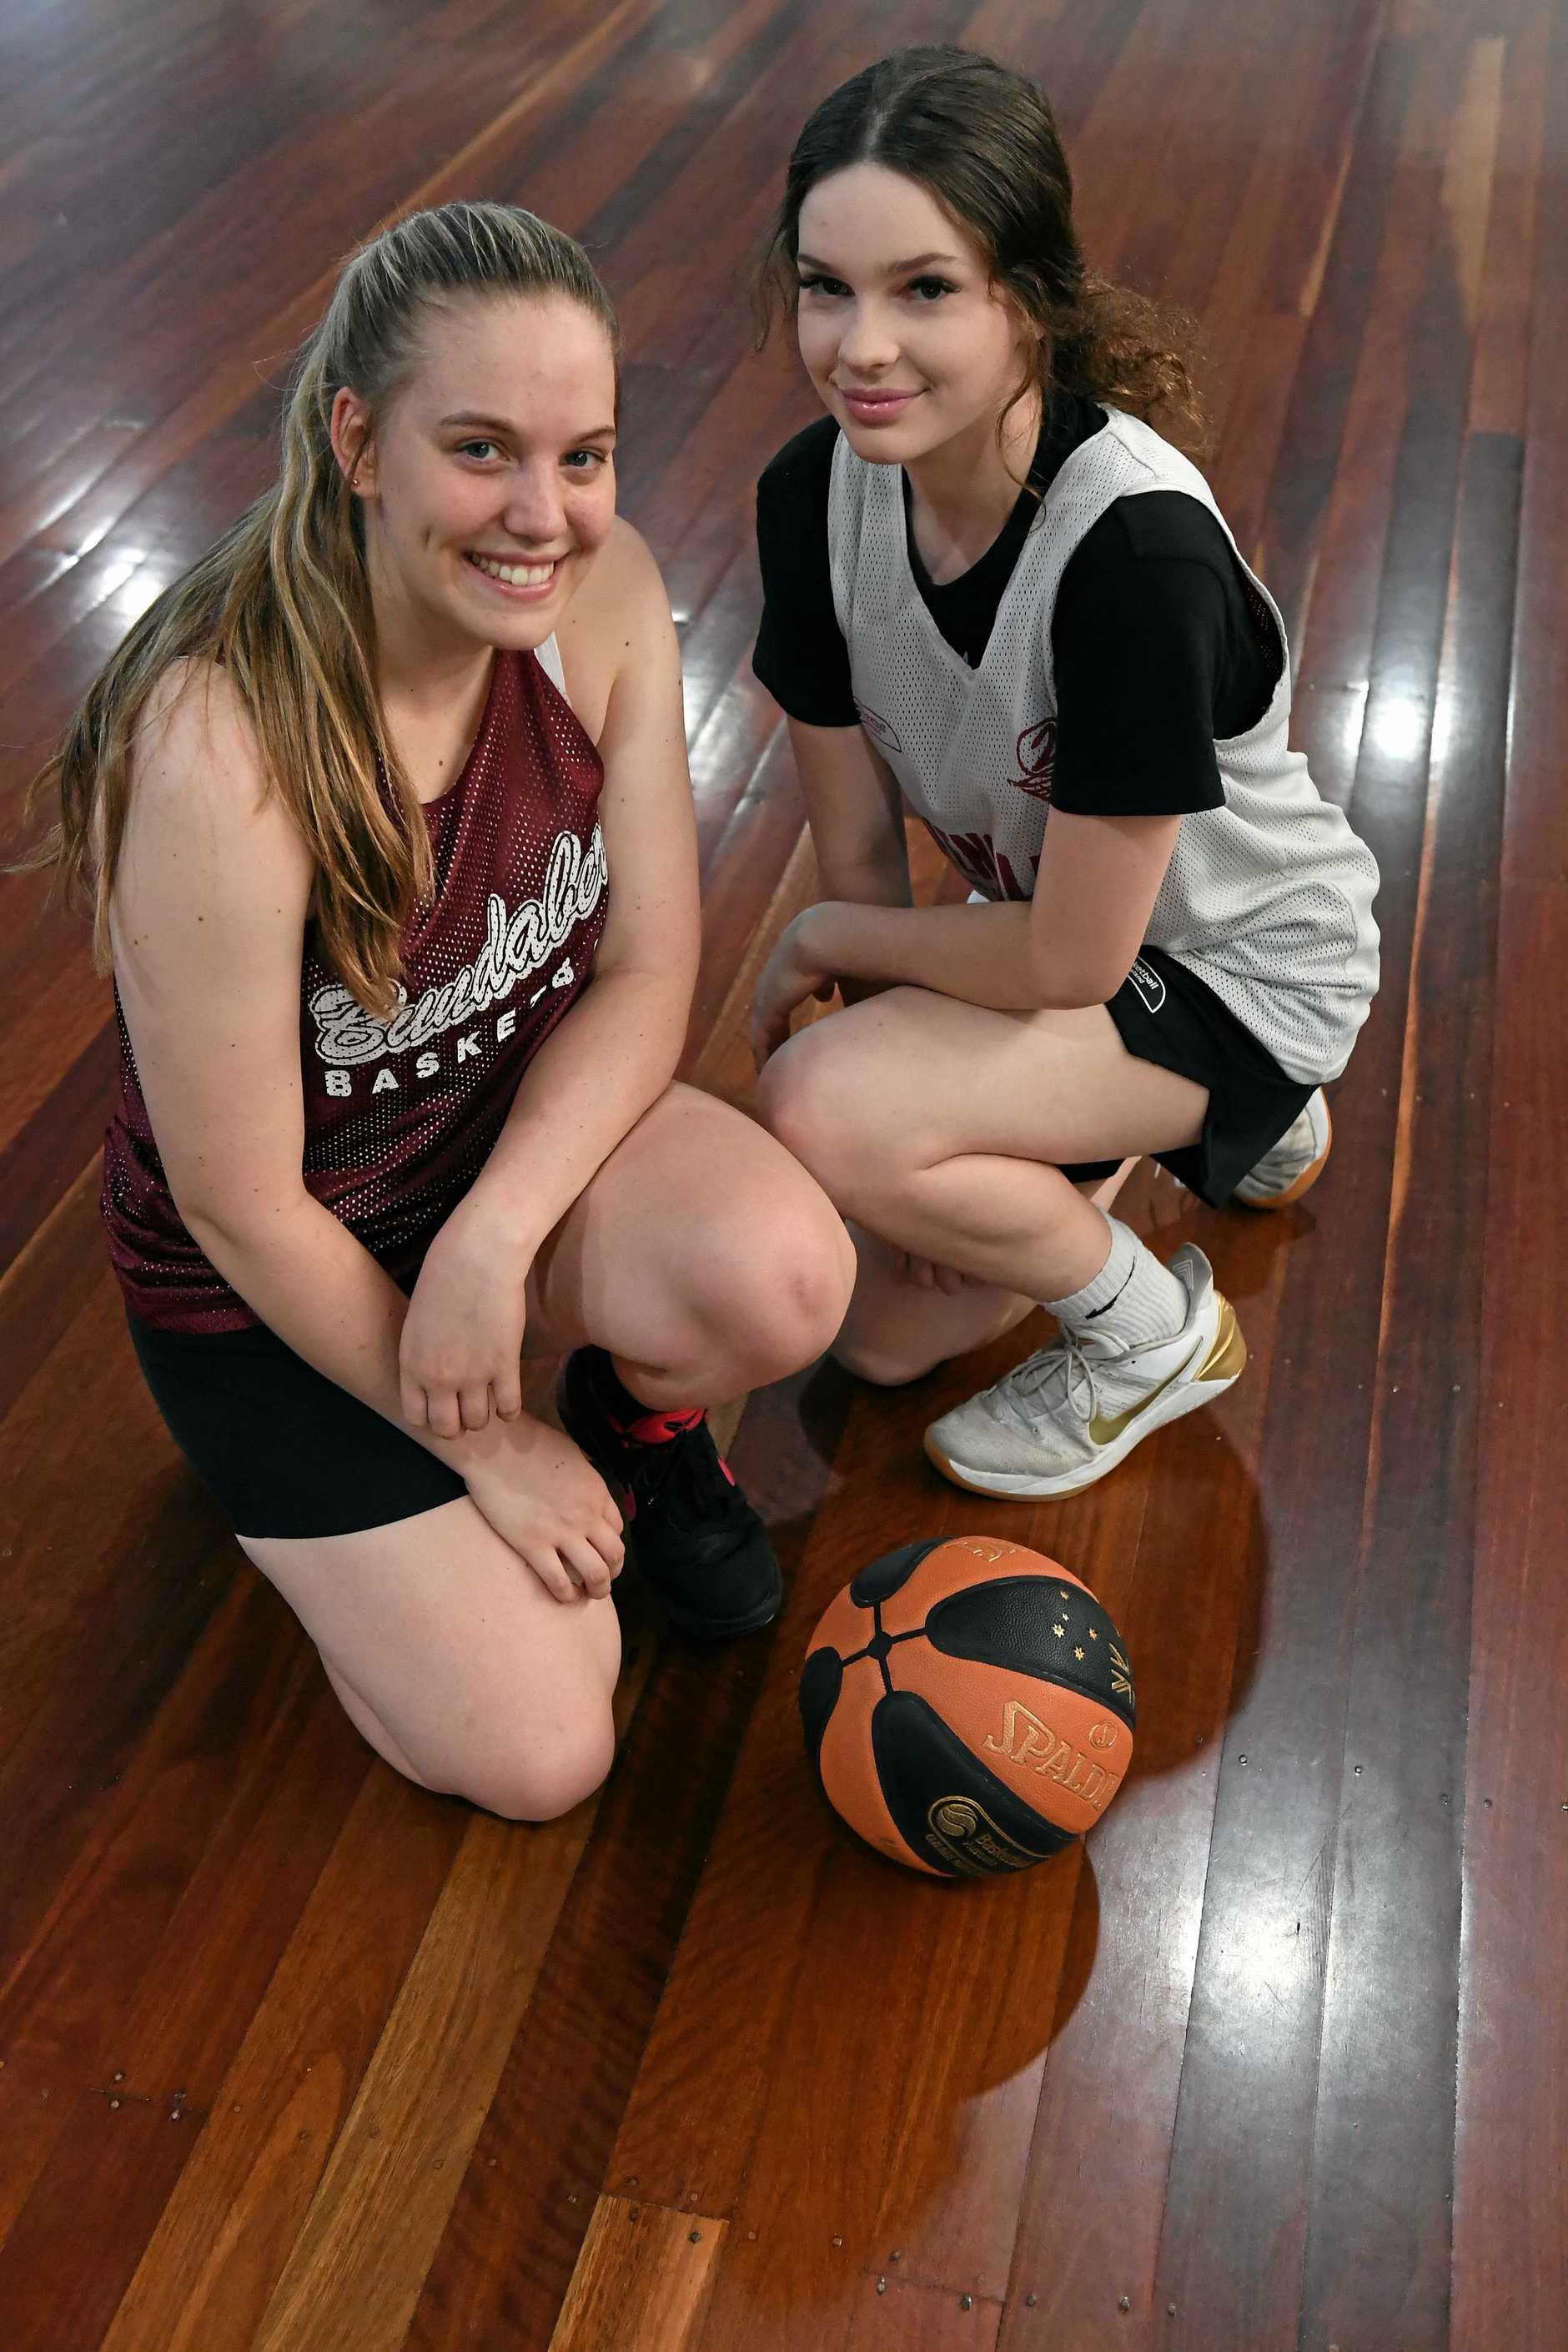 BASKETBALL: Makayla Mortensen and Lucy McCollum.